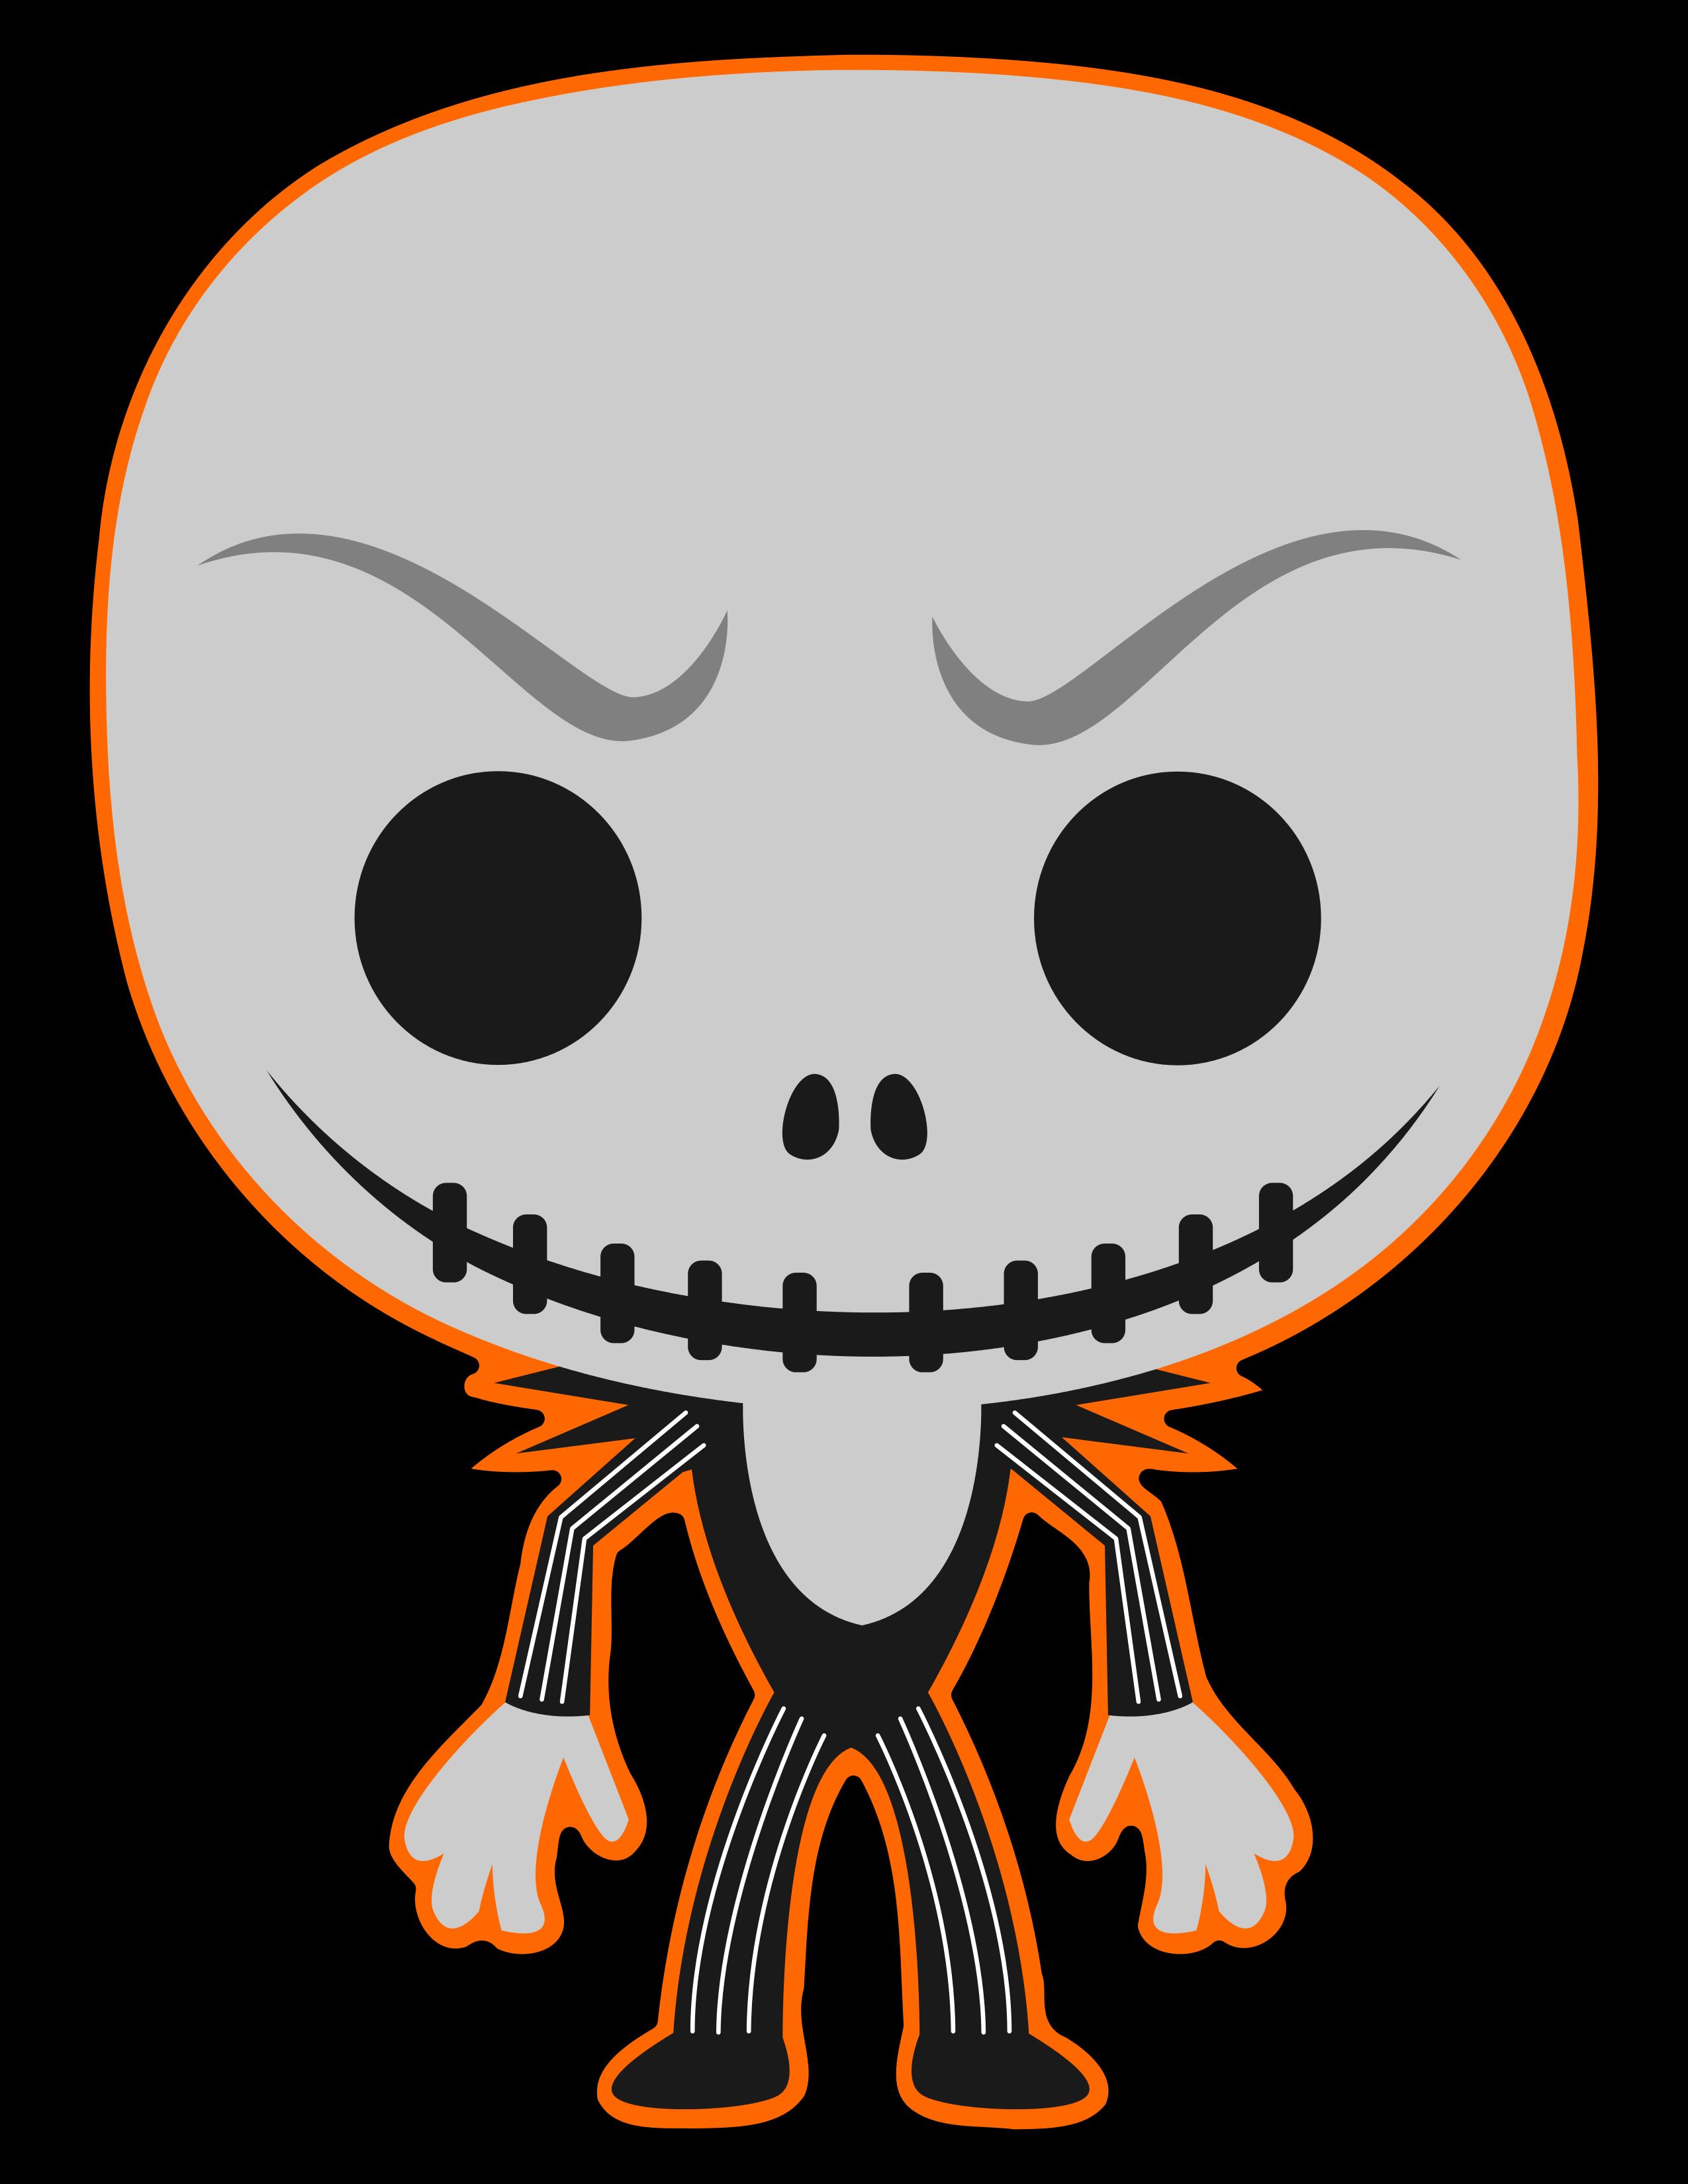 Halloween Clipart - Chucky, Dracula, Freddy Krueger, Jack ... image library download